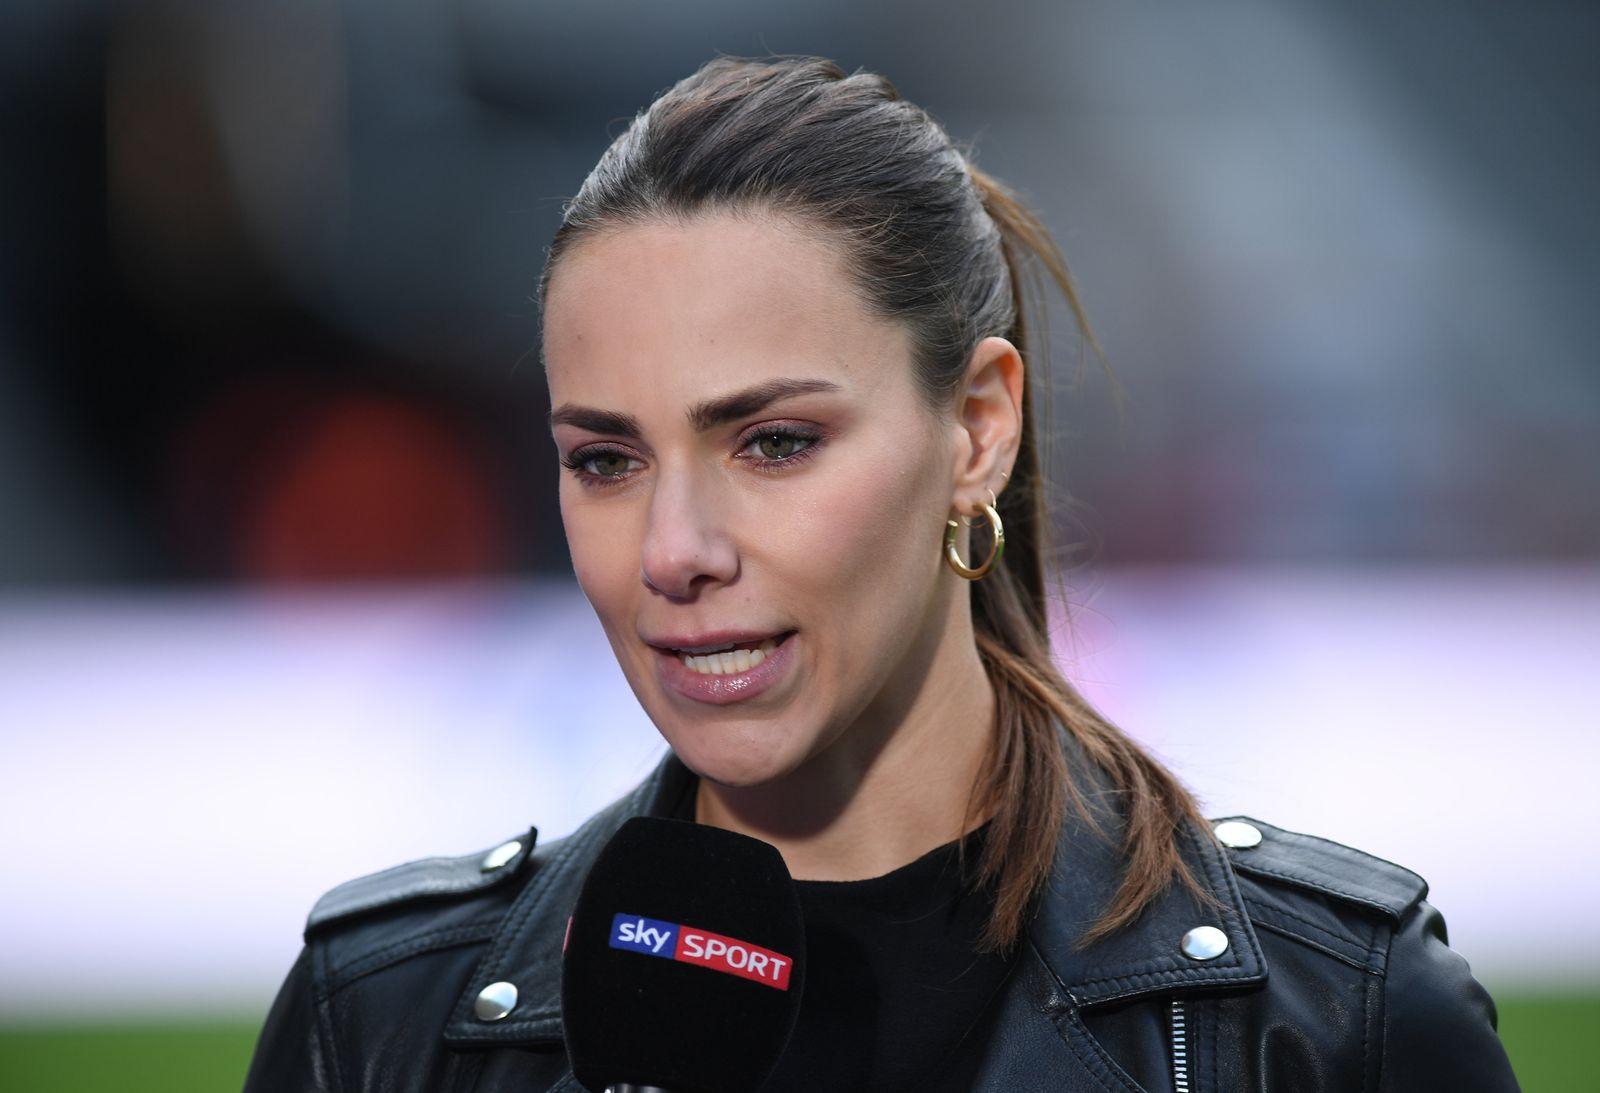 Sportjournalistin Esther Sedlaczek